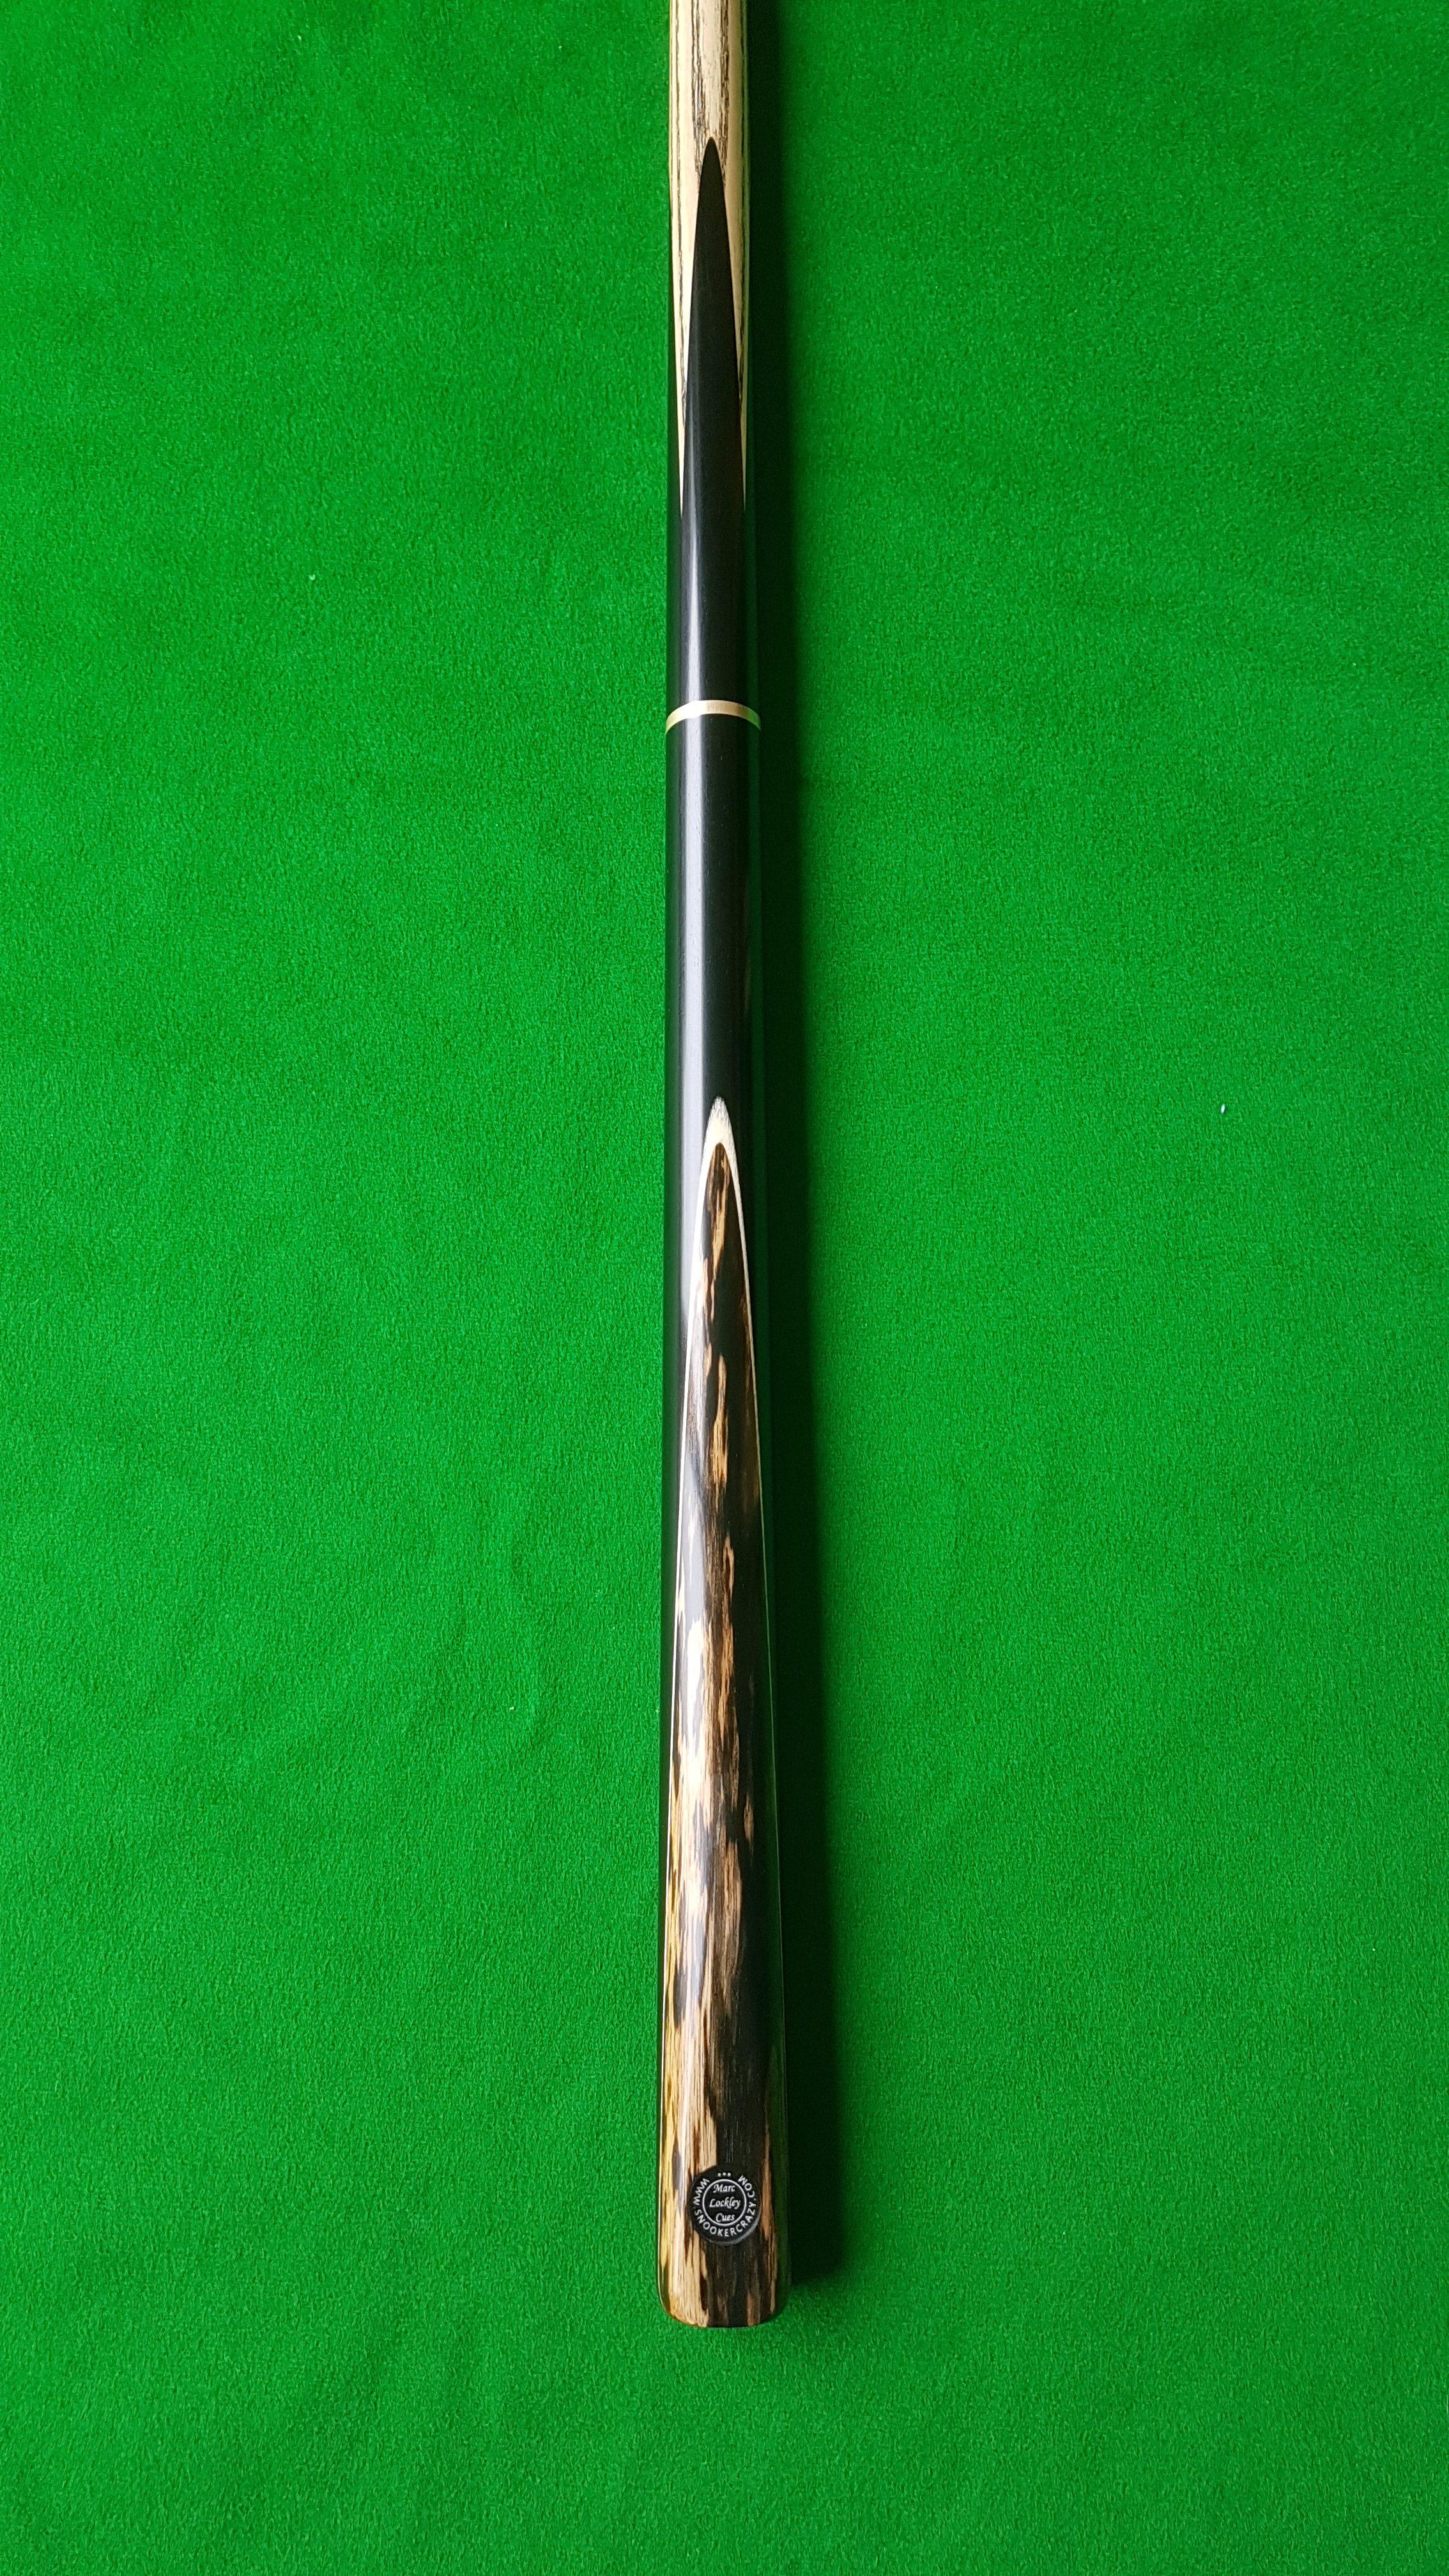 57 Three Quarter Black Foxwood Ebony Snooker Cue